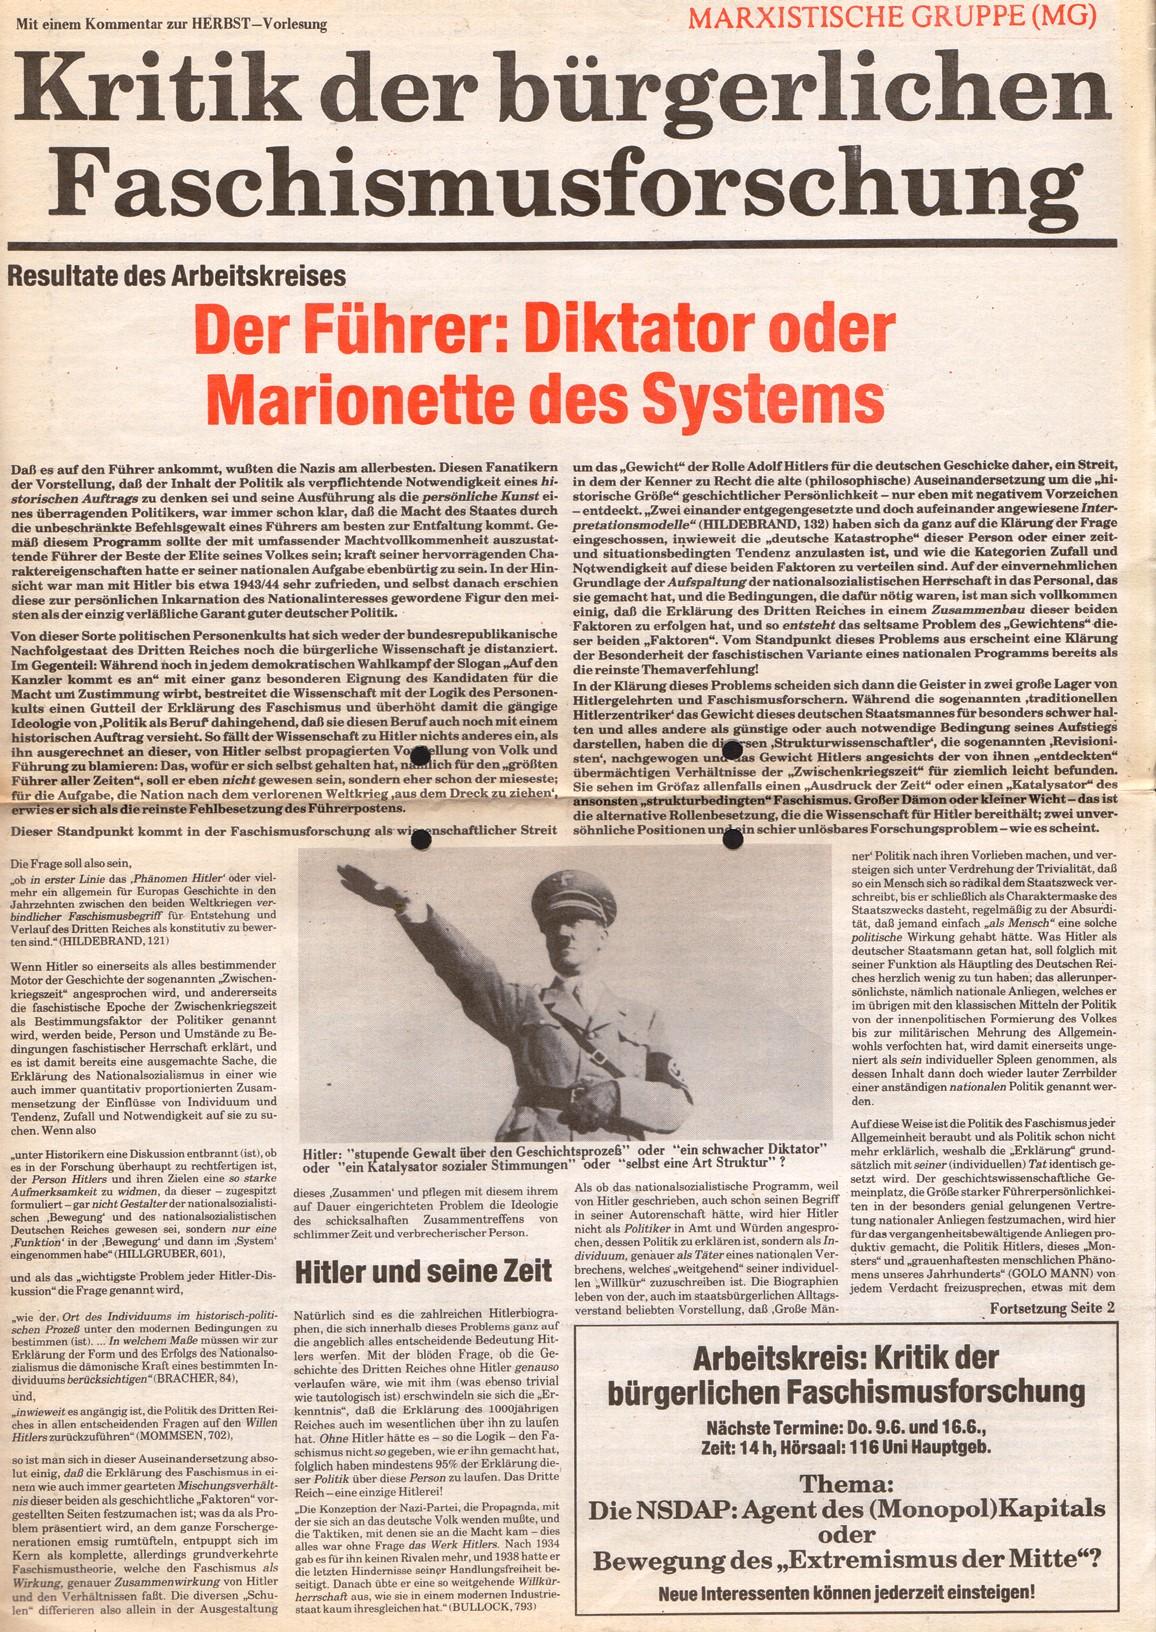 Muenchen_MG_FB_19880600_01